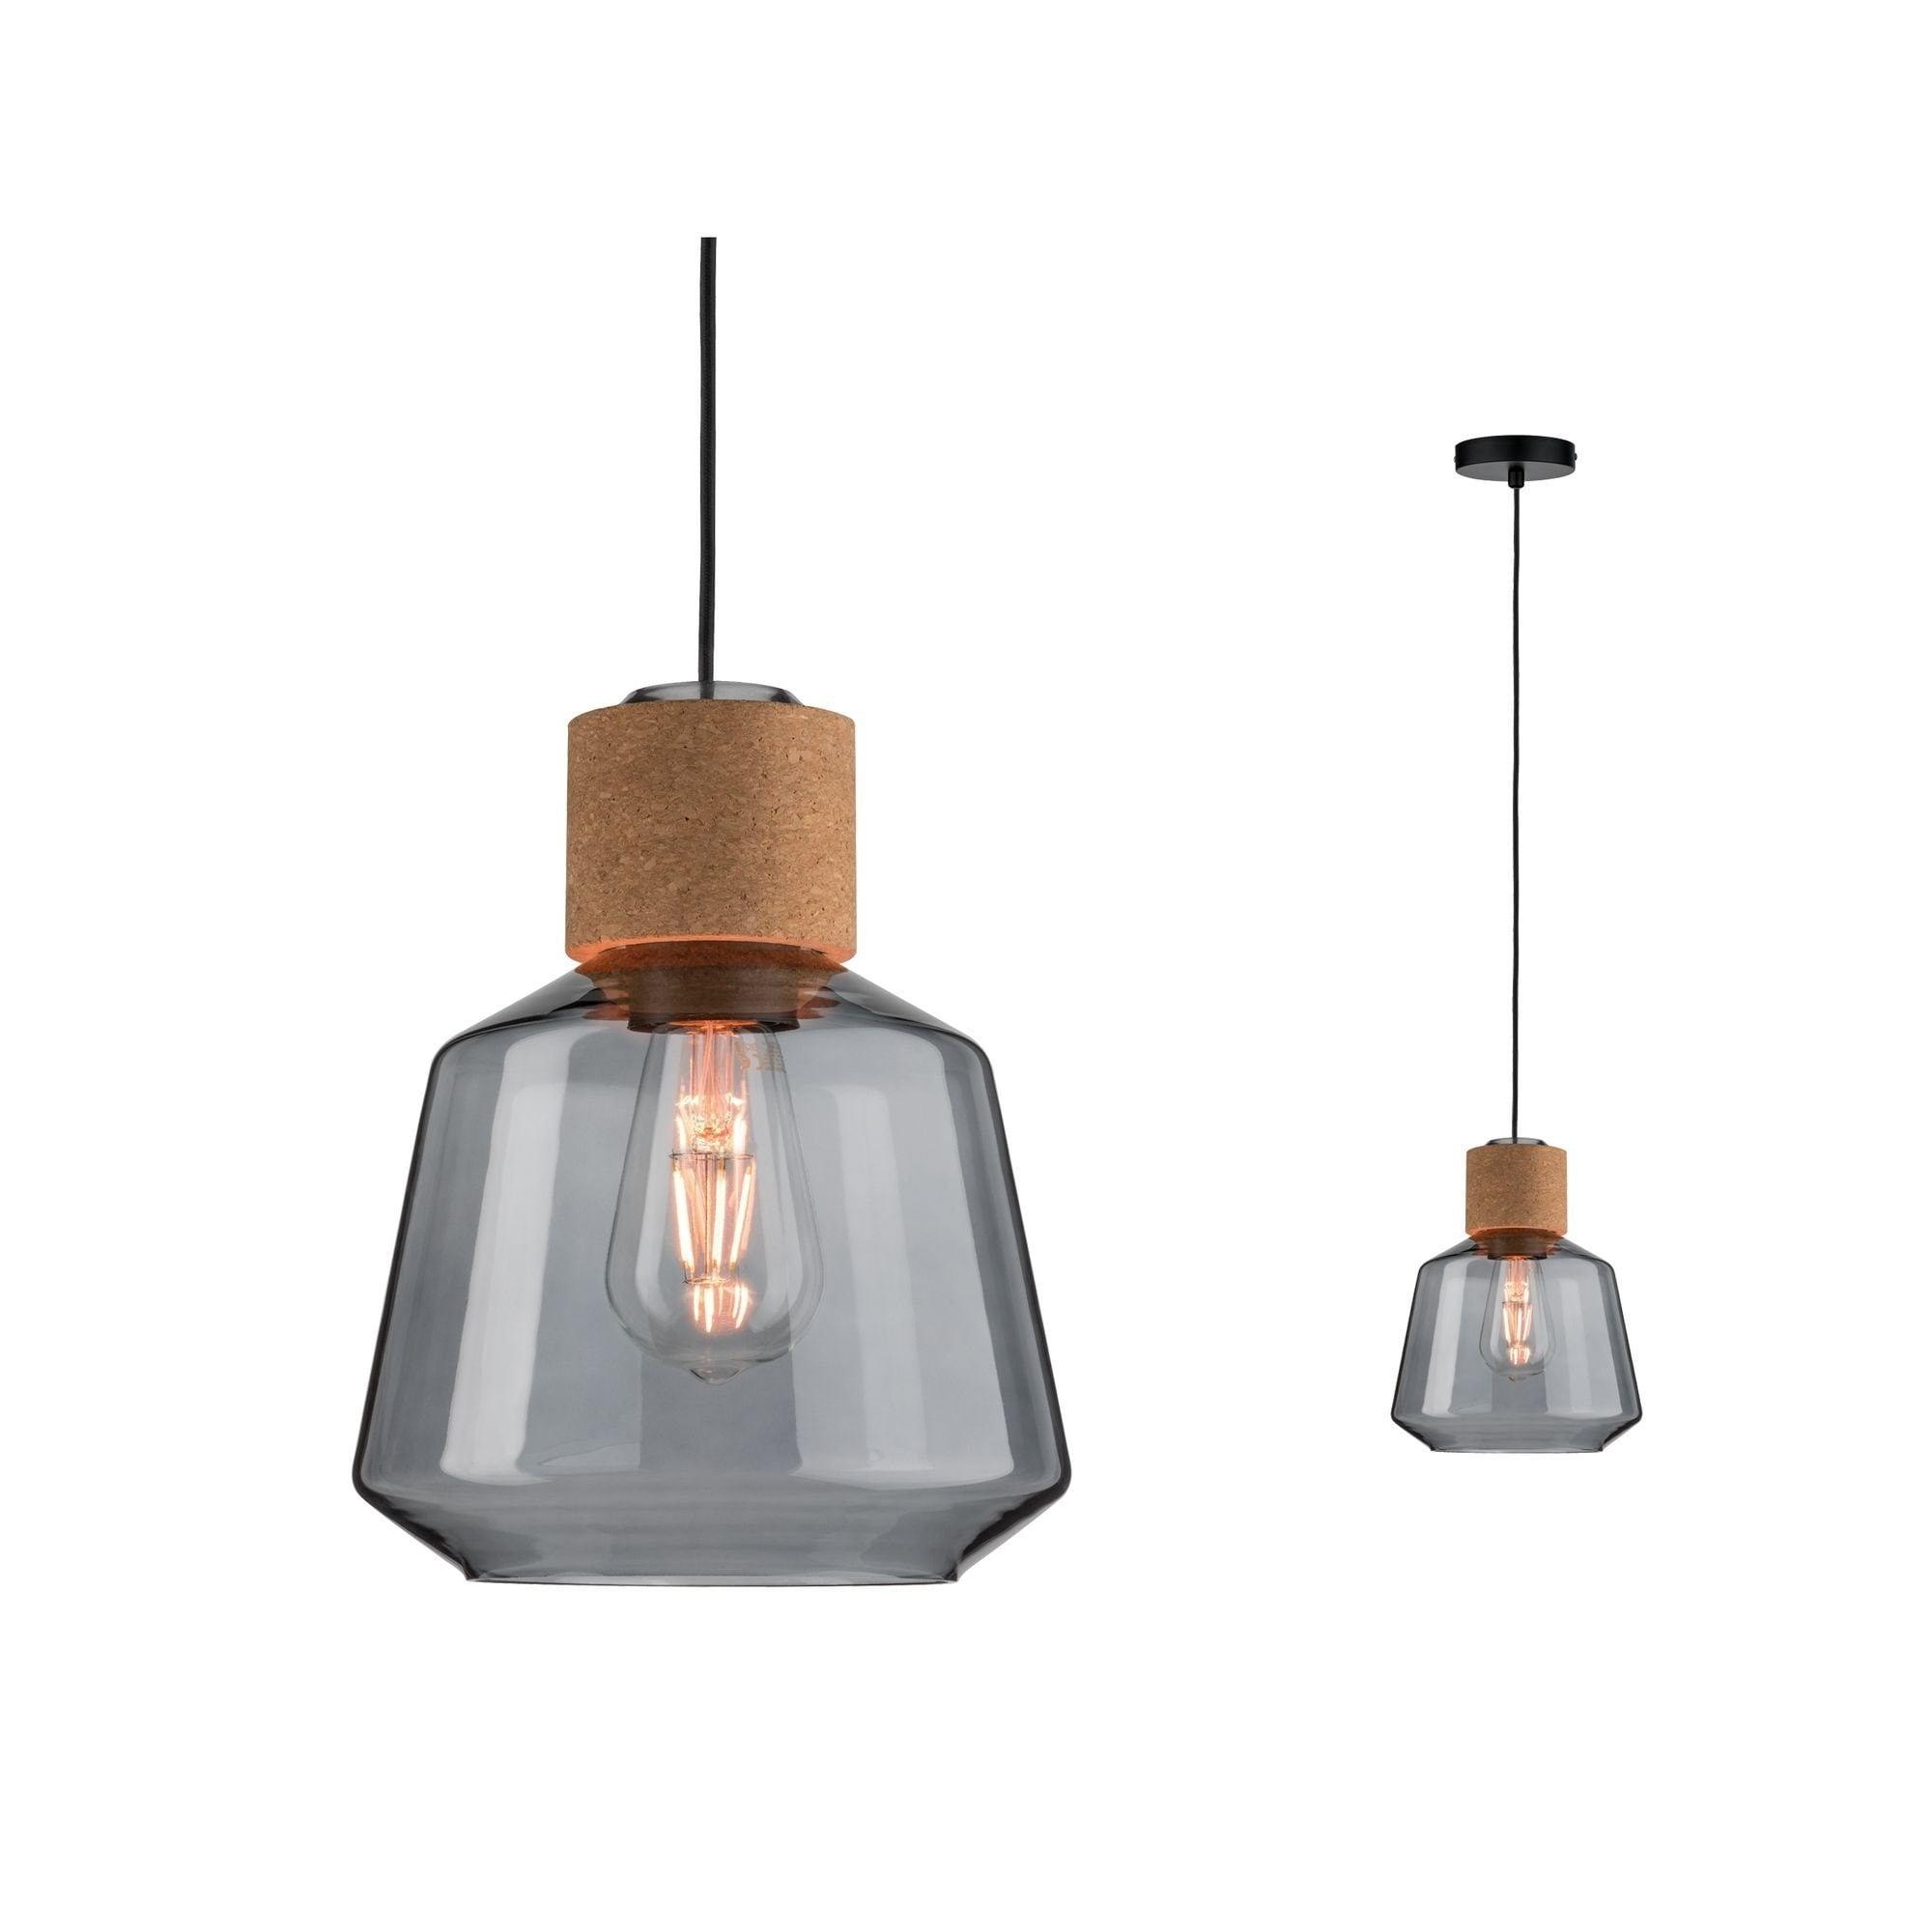 Paulmann,LED Pendelleuchte Elia Rauchglas/Kork/Schwarz max. 20W E27